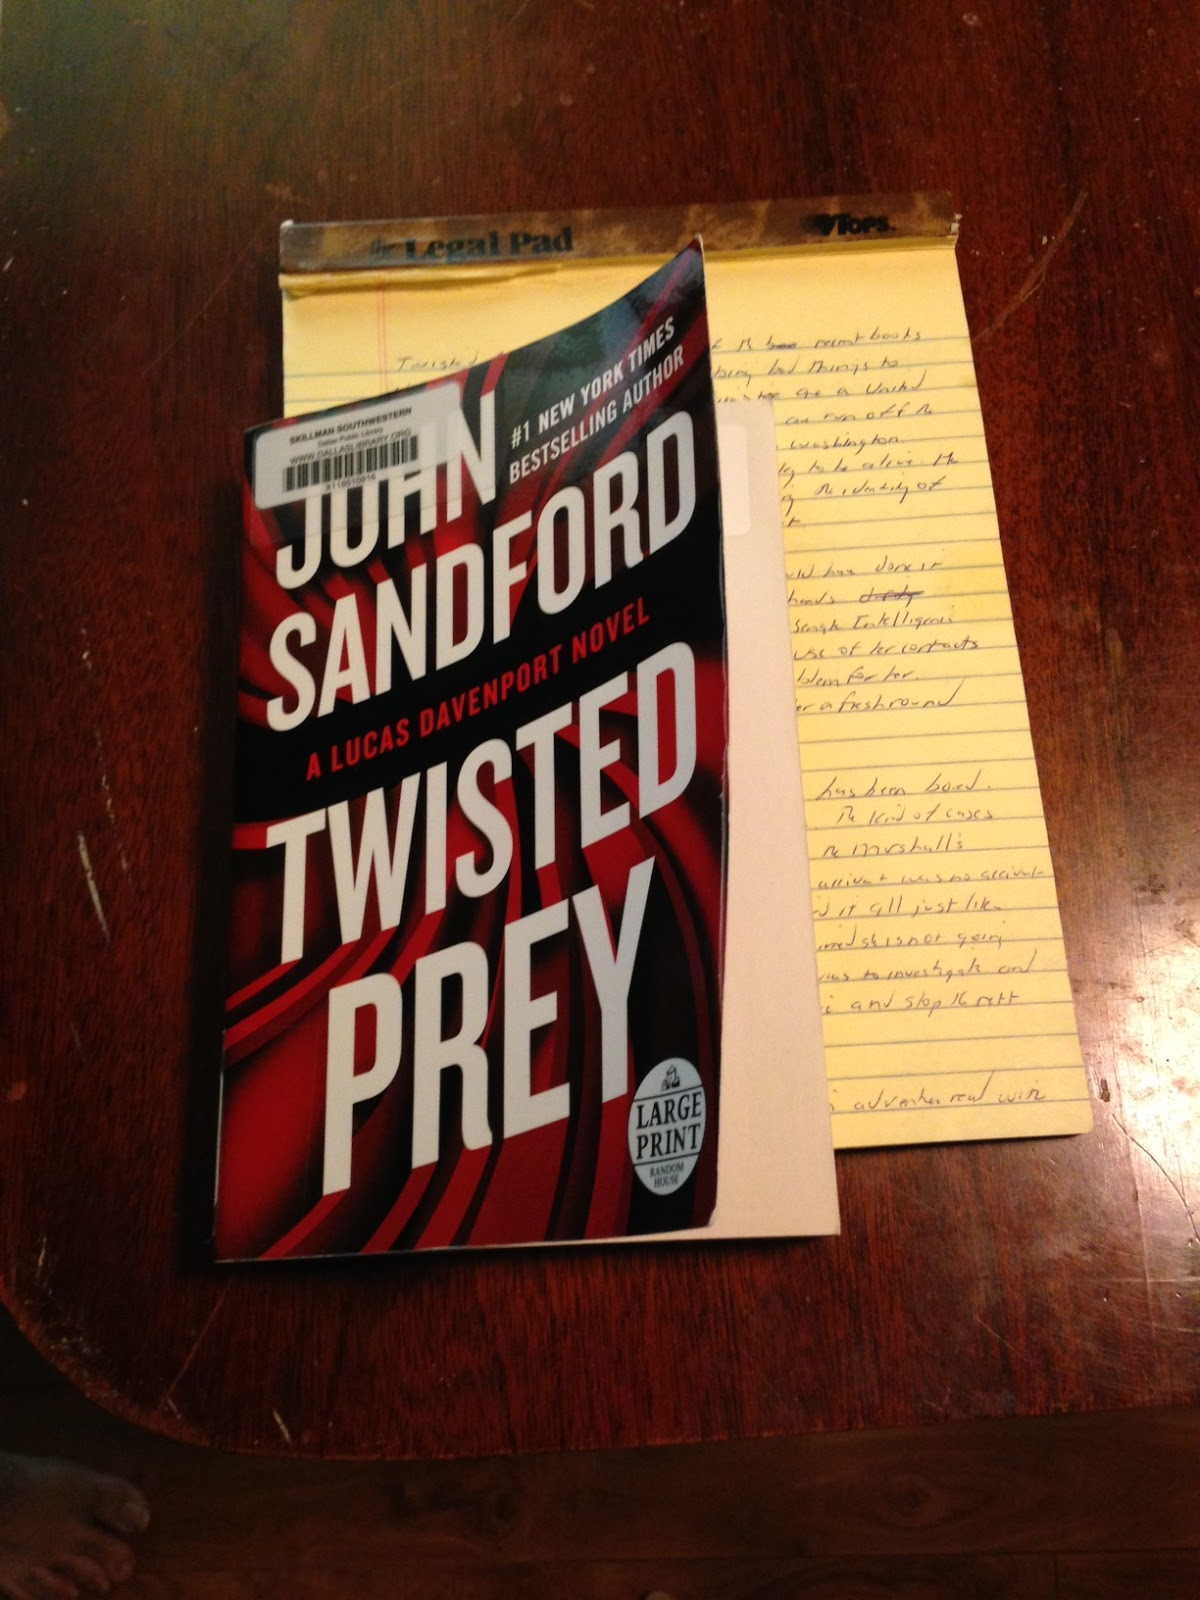 Review Twisted Prey A Lucas Davenport Novel By John Sandford